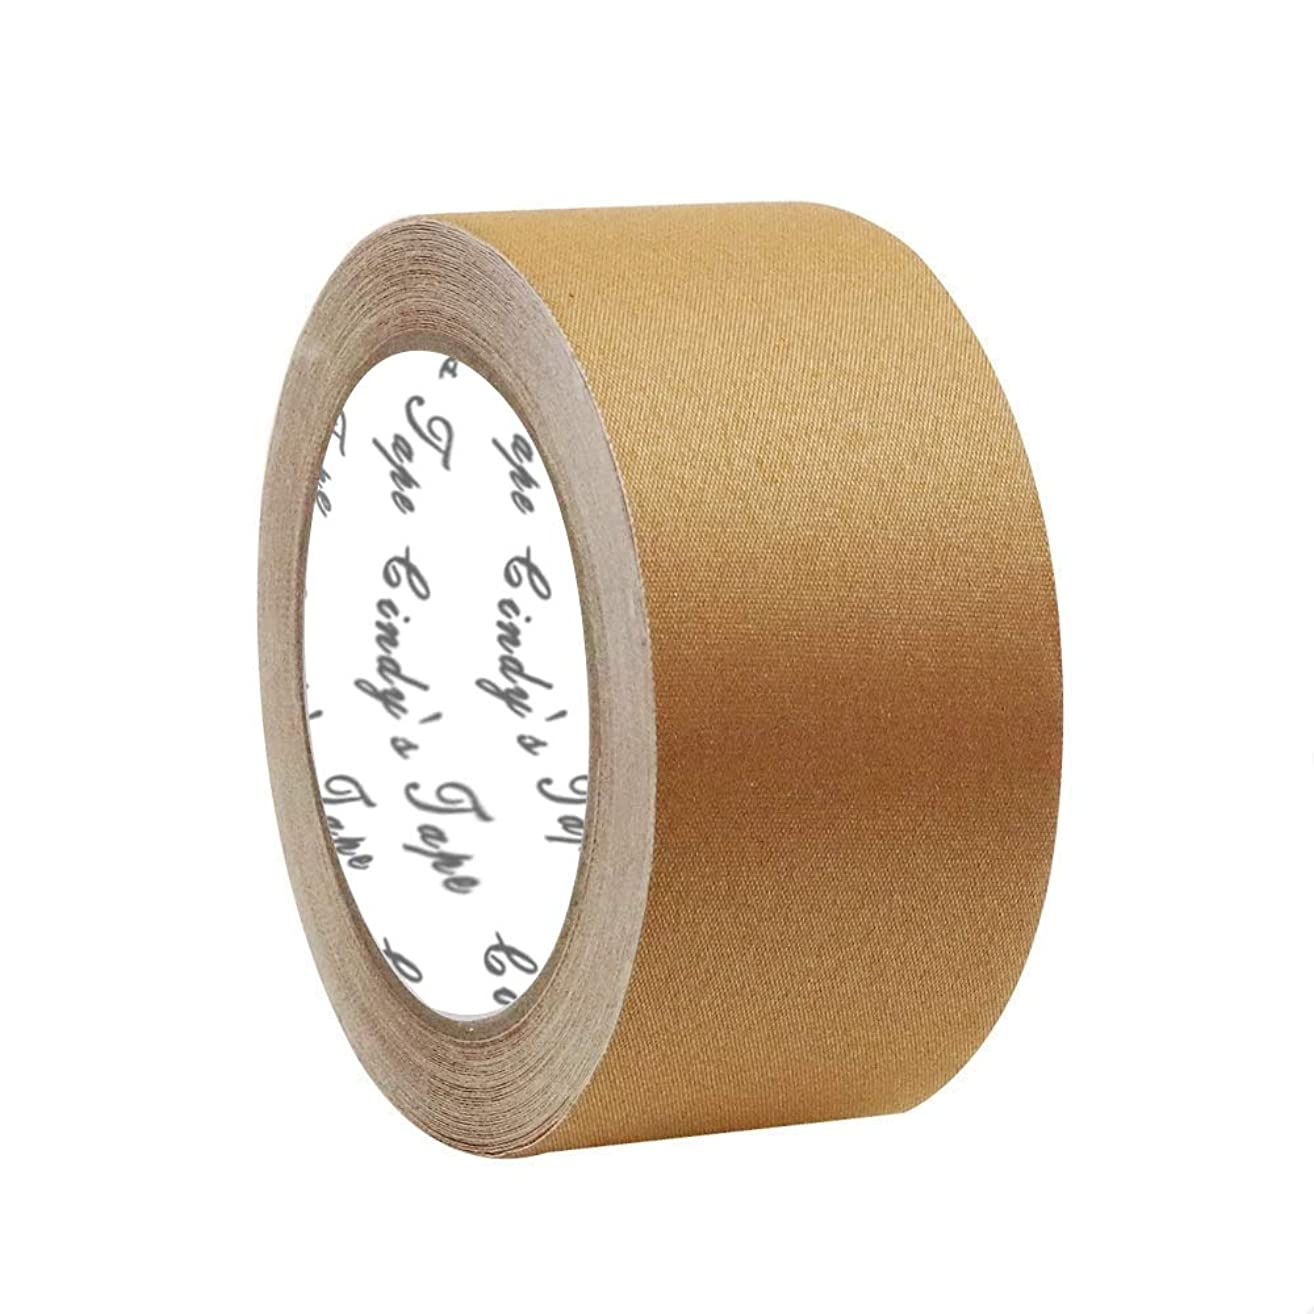 Boob Tape 4colors (DIY LIFT Boob Job!PUSH UP BREAST!)Body Tape,Breast Tape,Bra Tape,Foot Tape,(2.2inch×67feet) Professional Grade cloth and Waterproof.(KIM K'S Trick!)